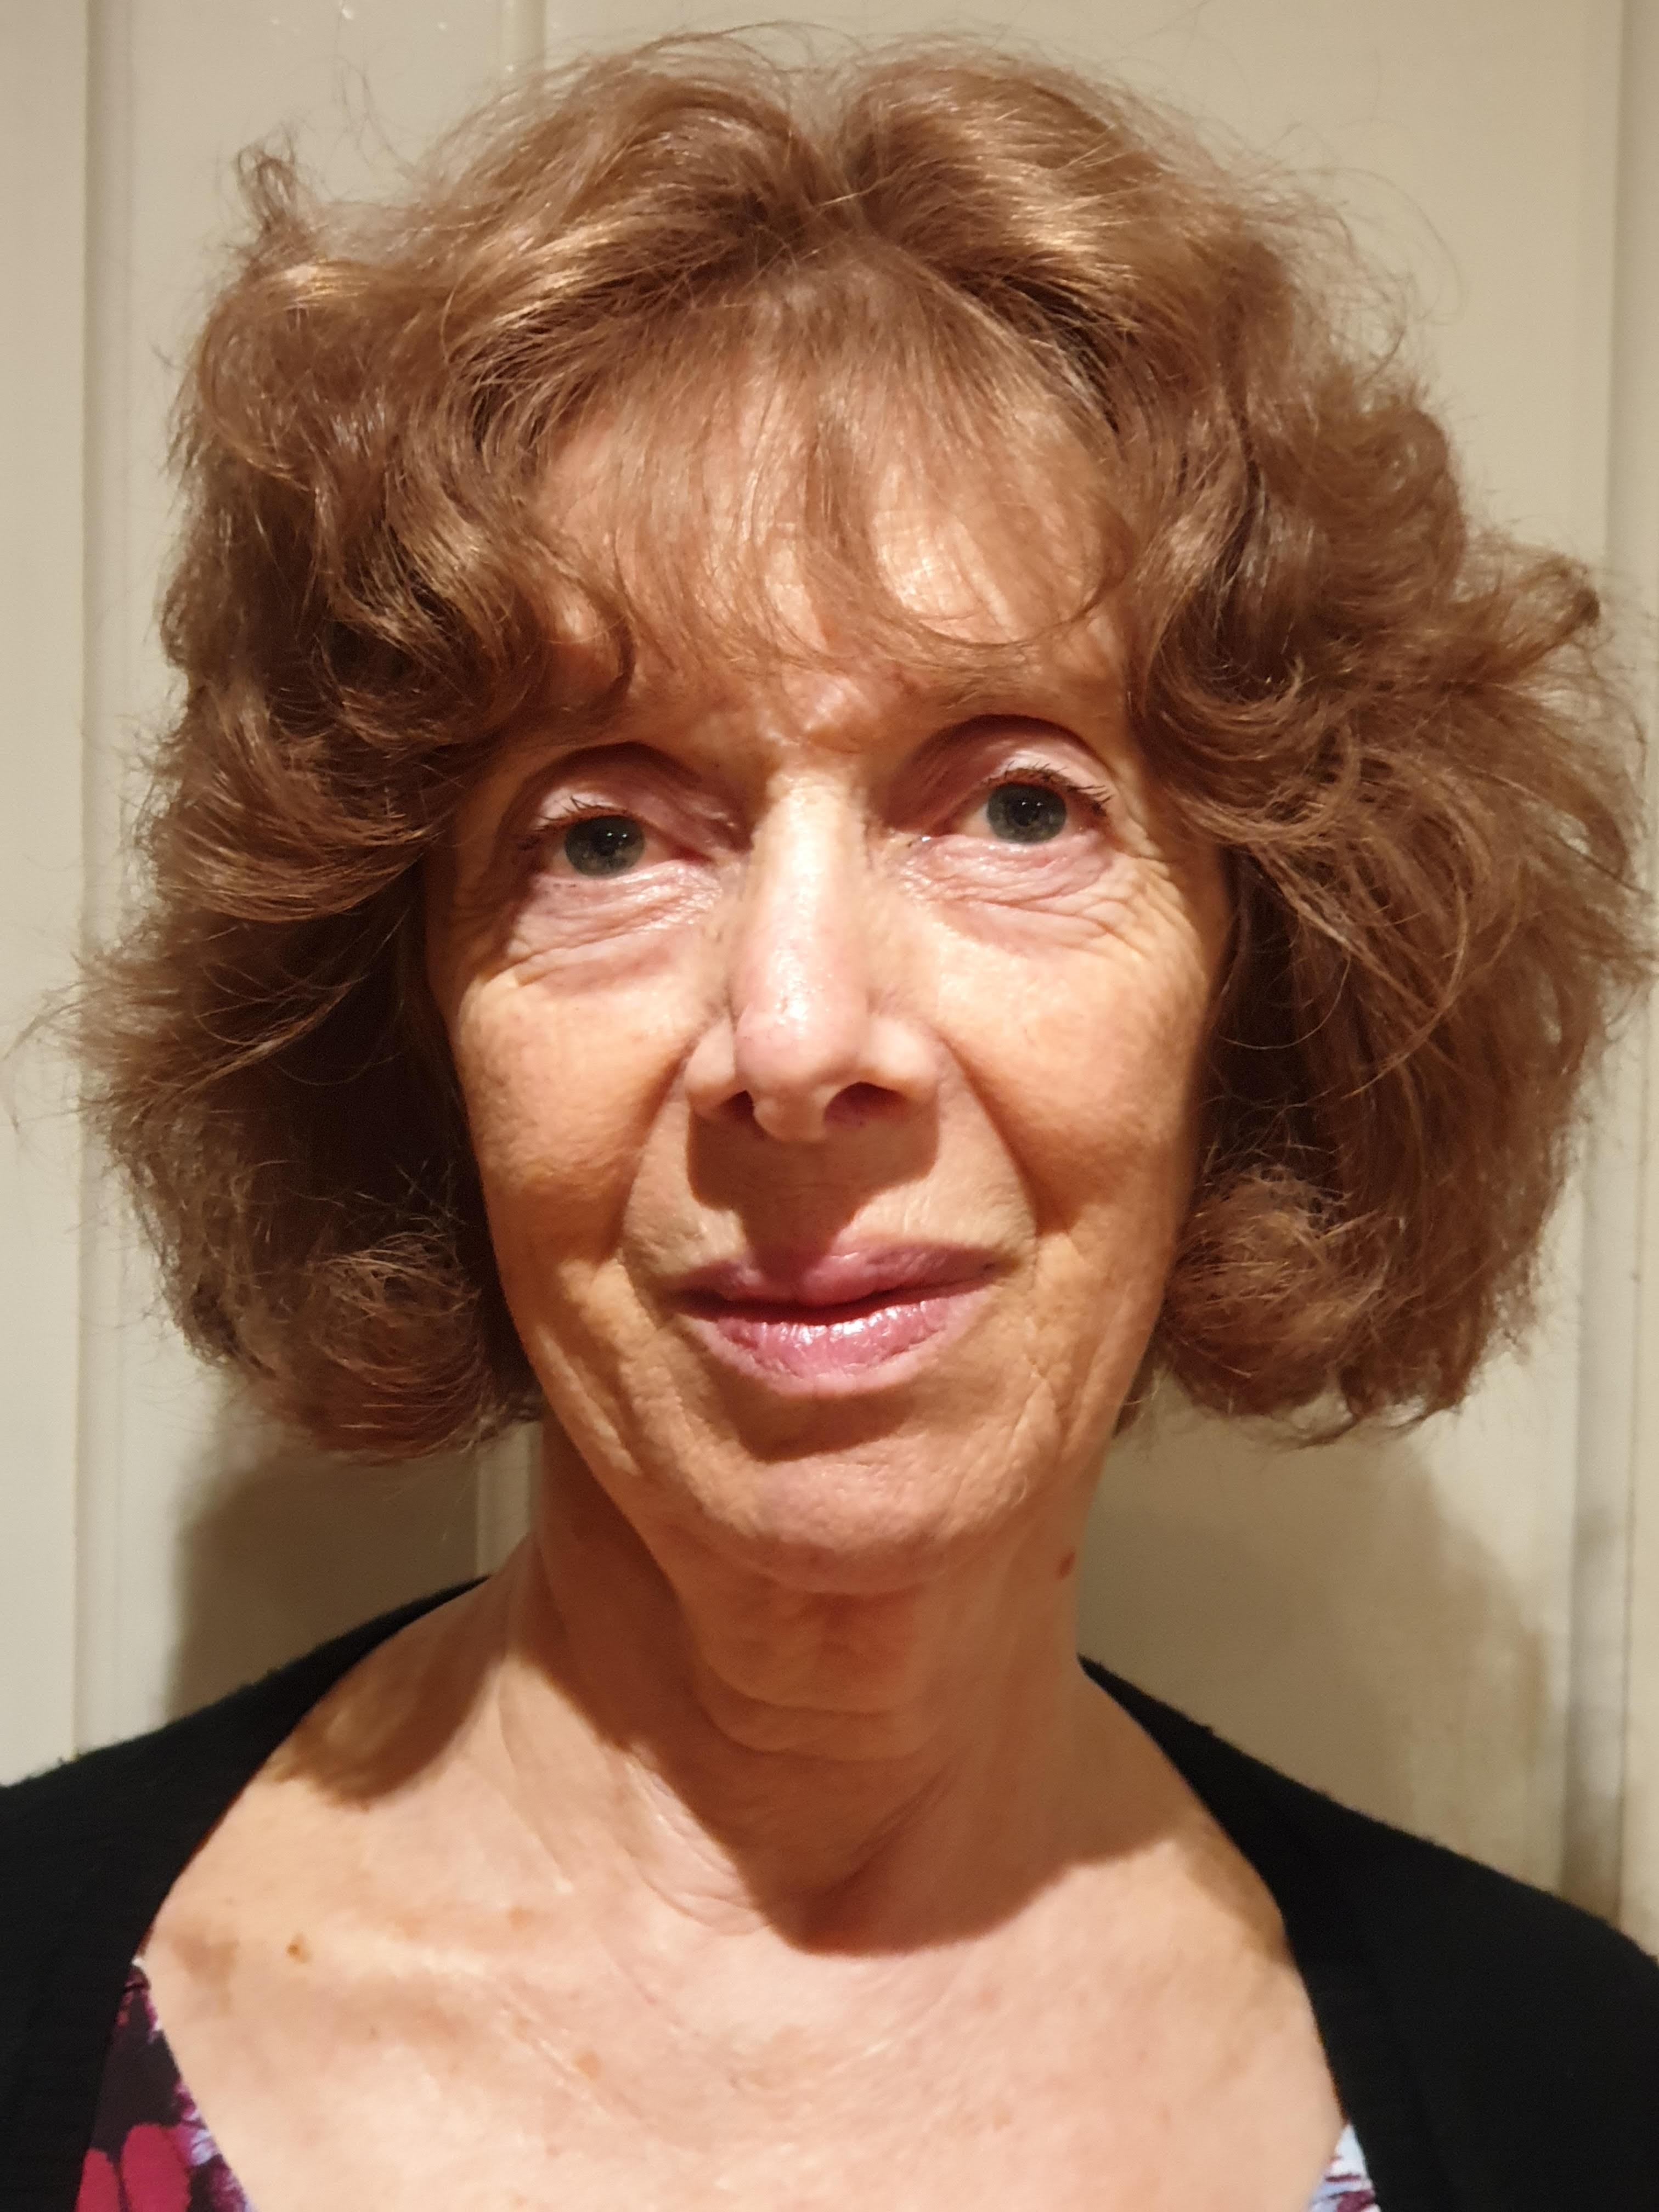 Judith Sherwood